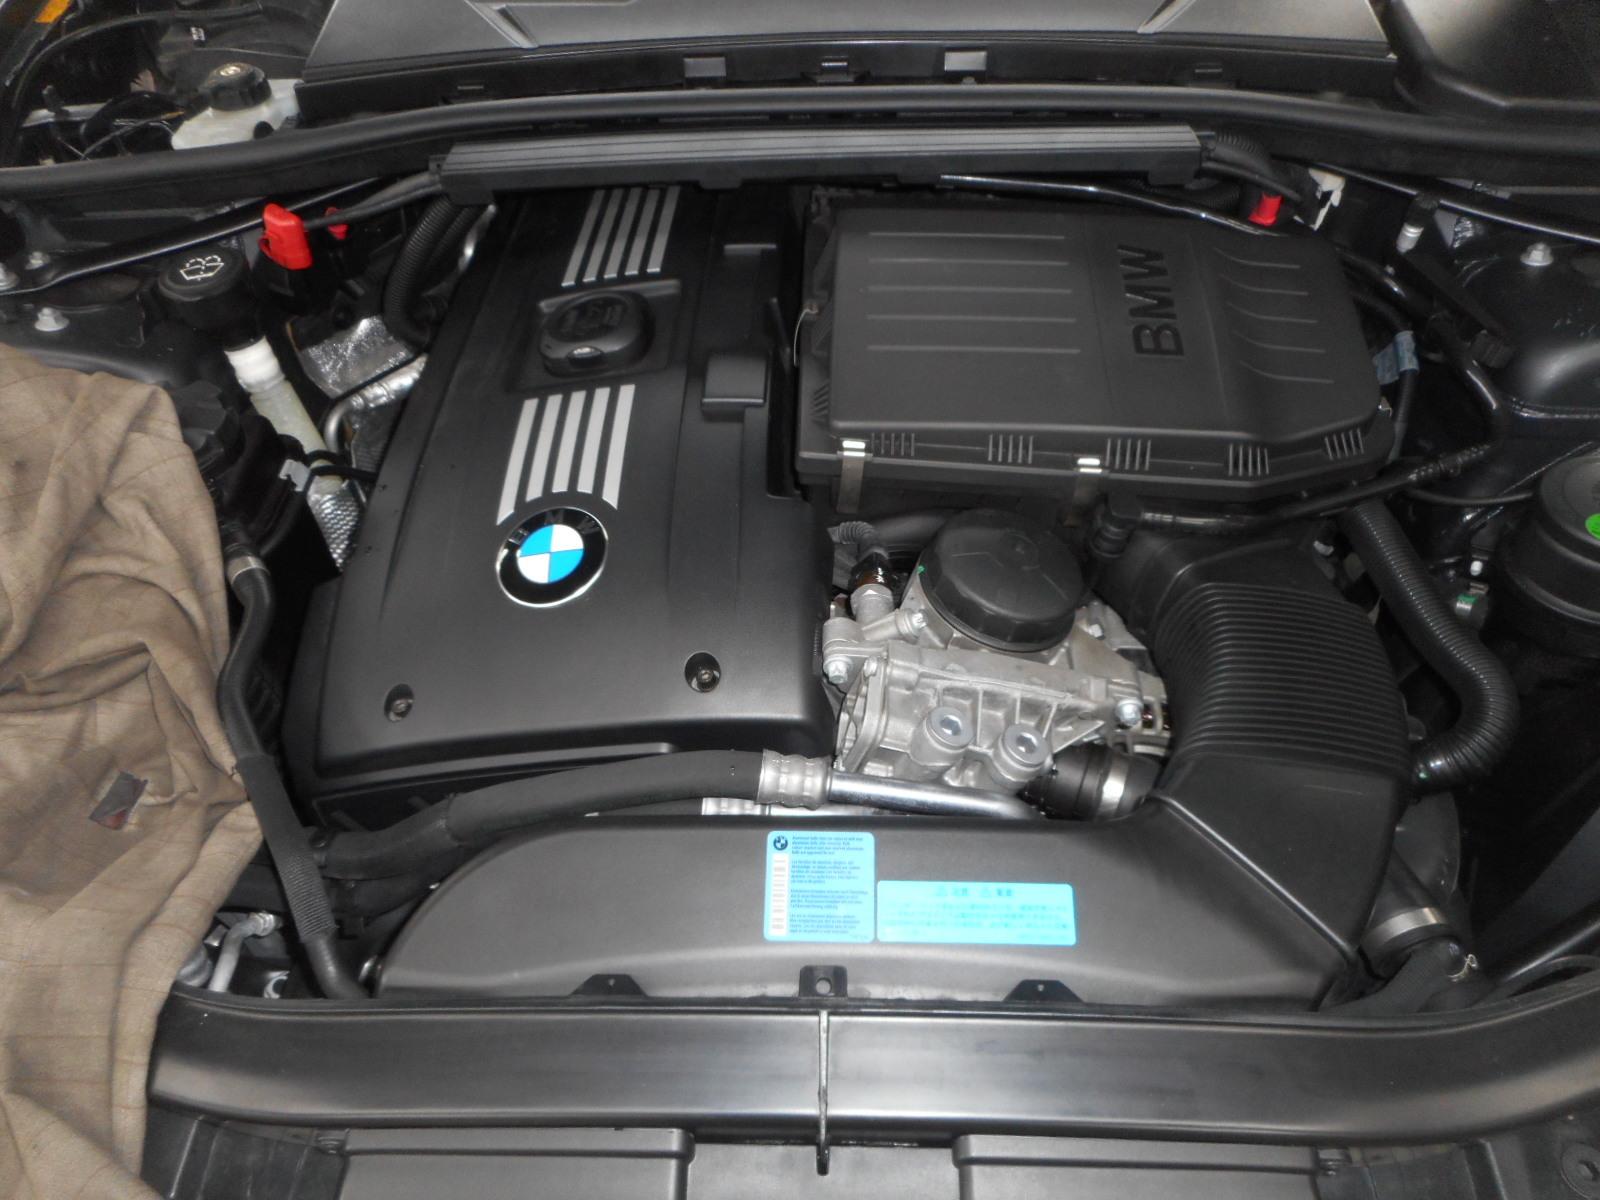 BMW335 クーペ (E90) エンジンオイル漏れ修理 納車整備_c0267693_17105943.jpg